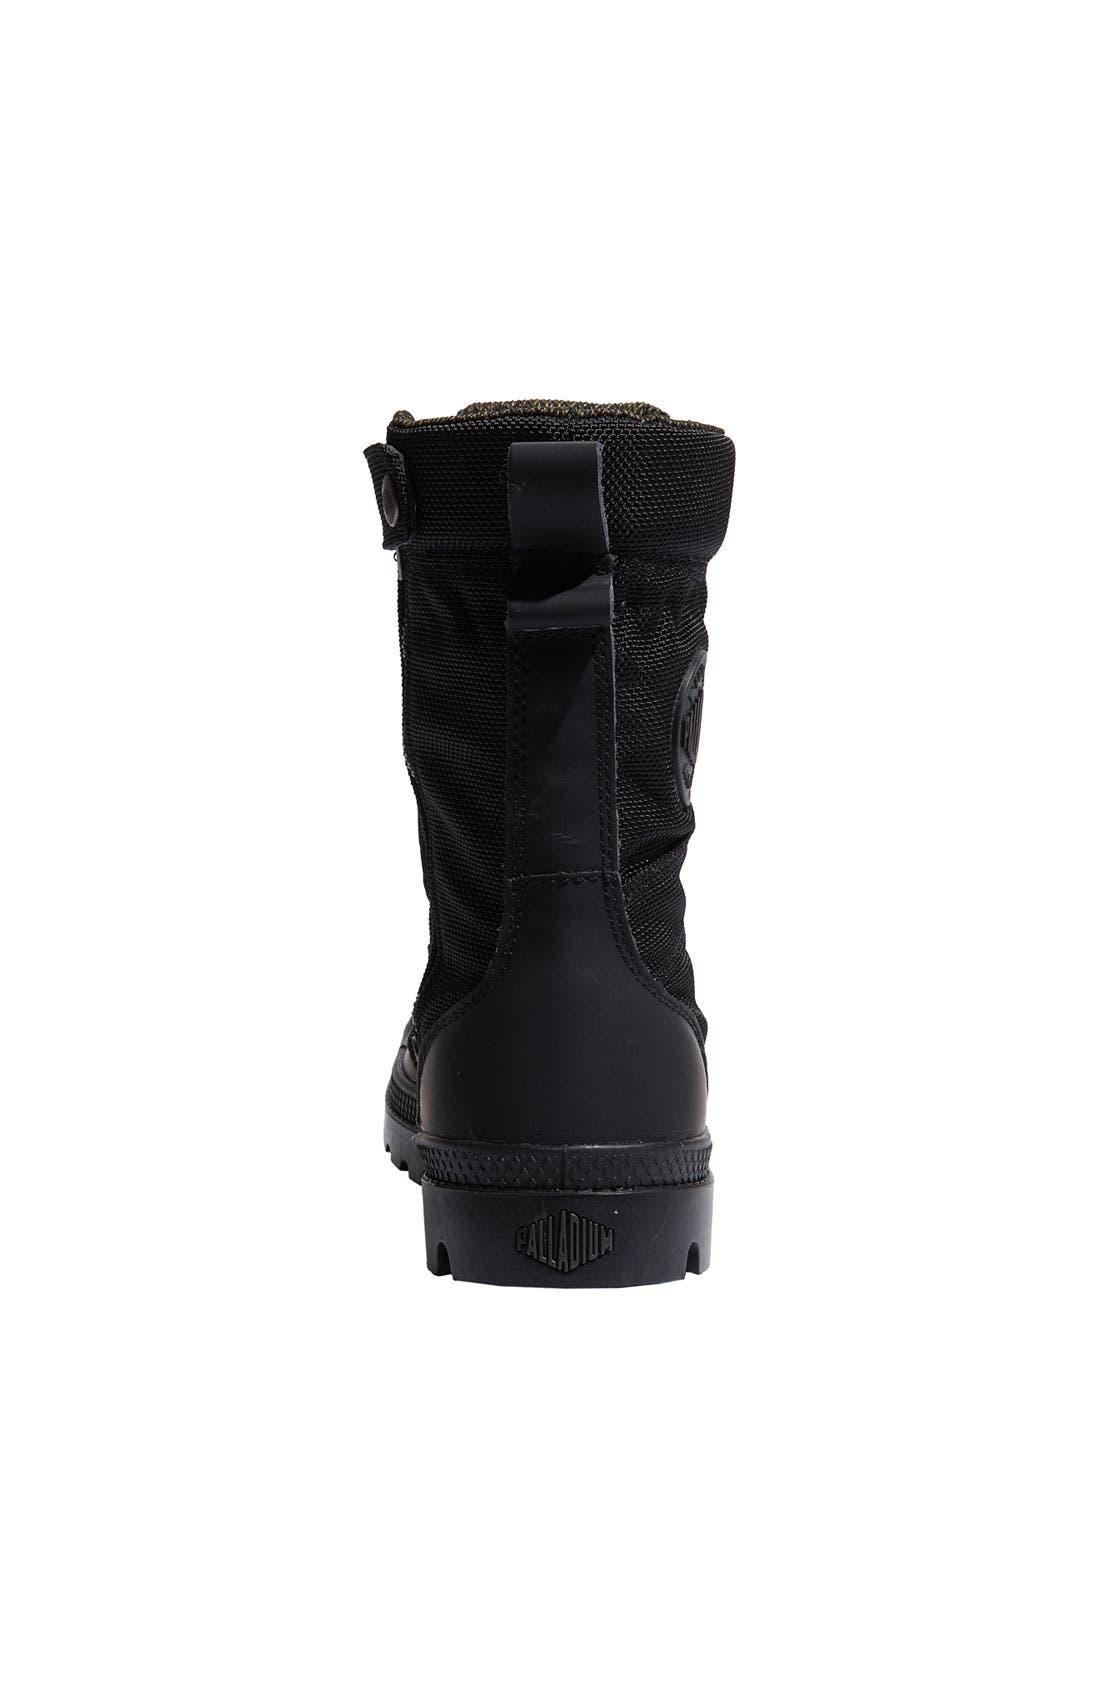 Alternate Image 4  - Palladium 'Pampa' Tactical Boot